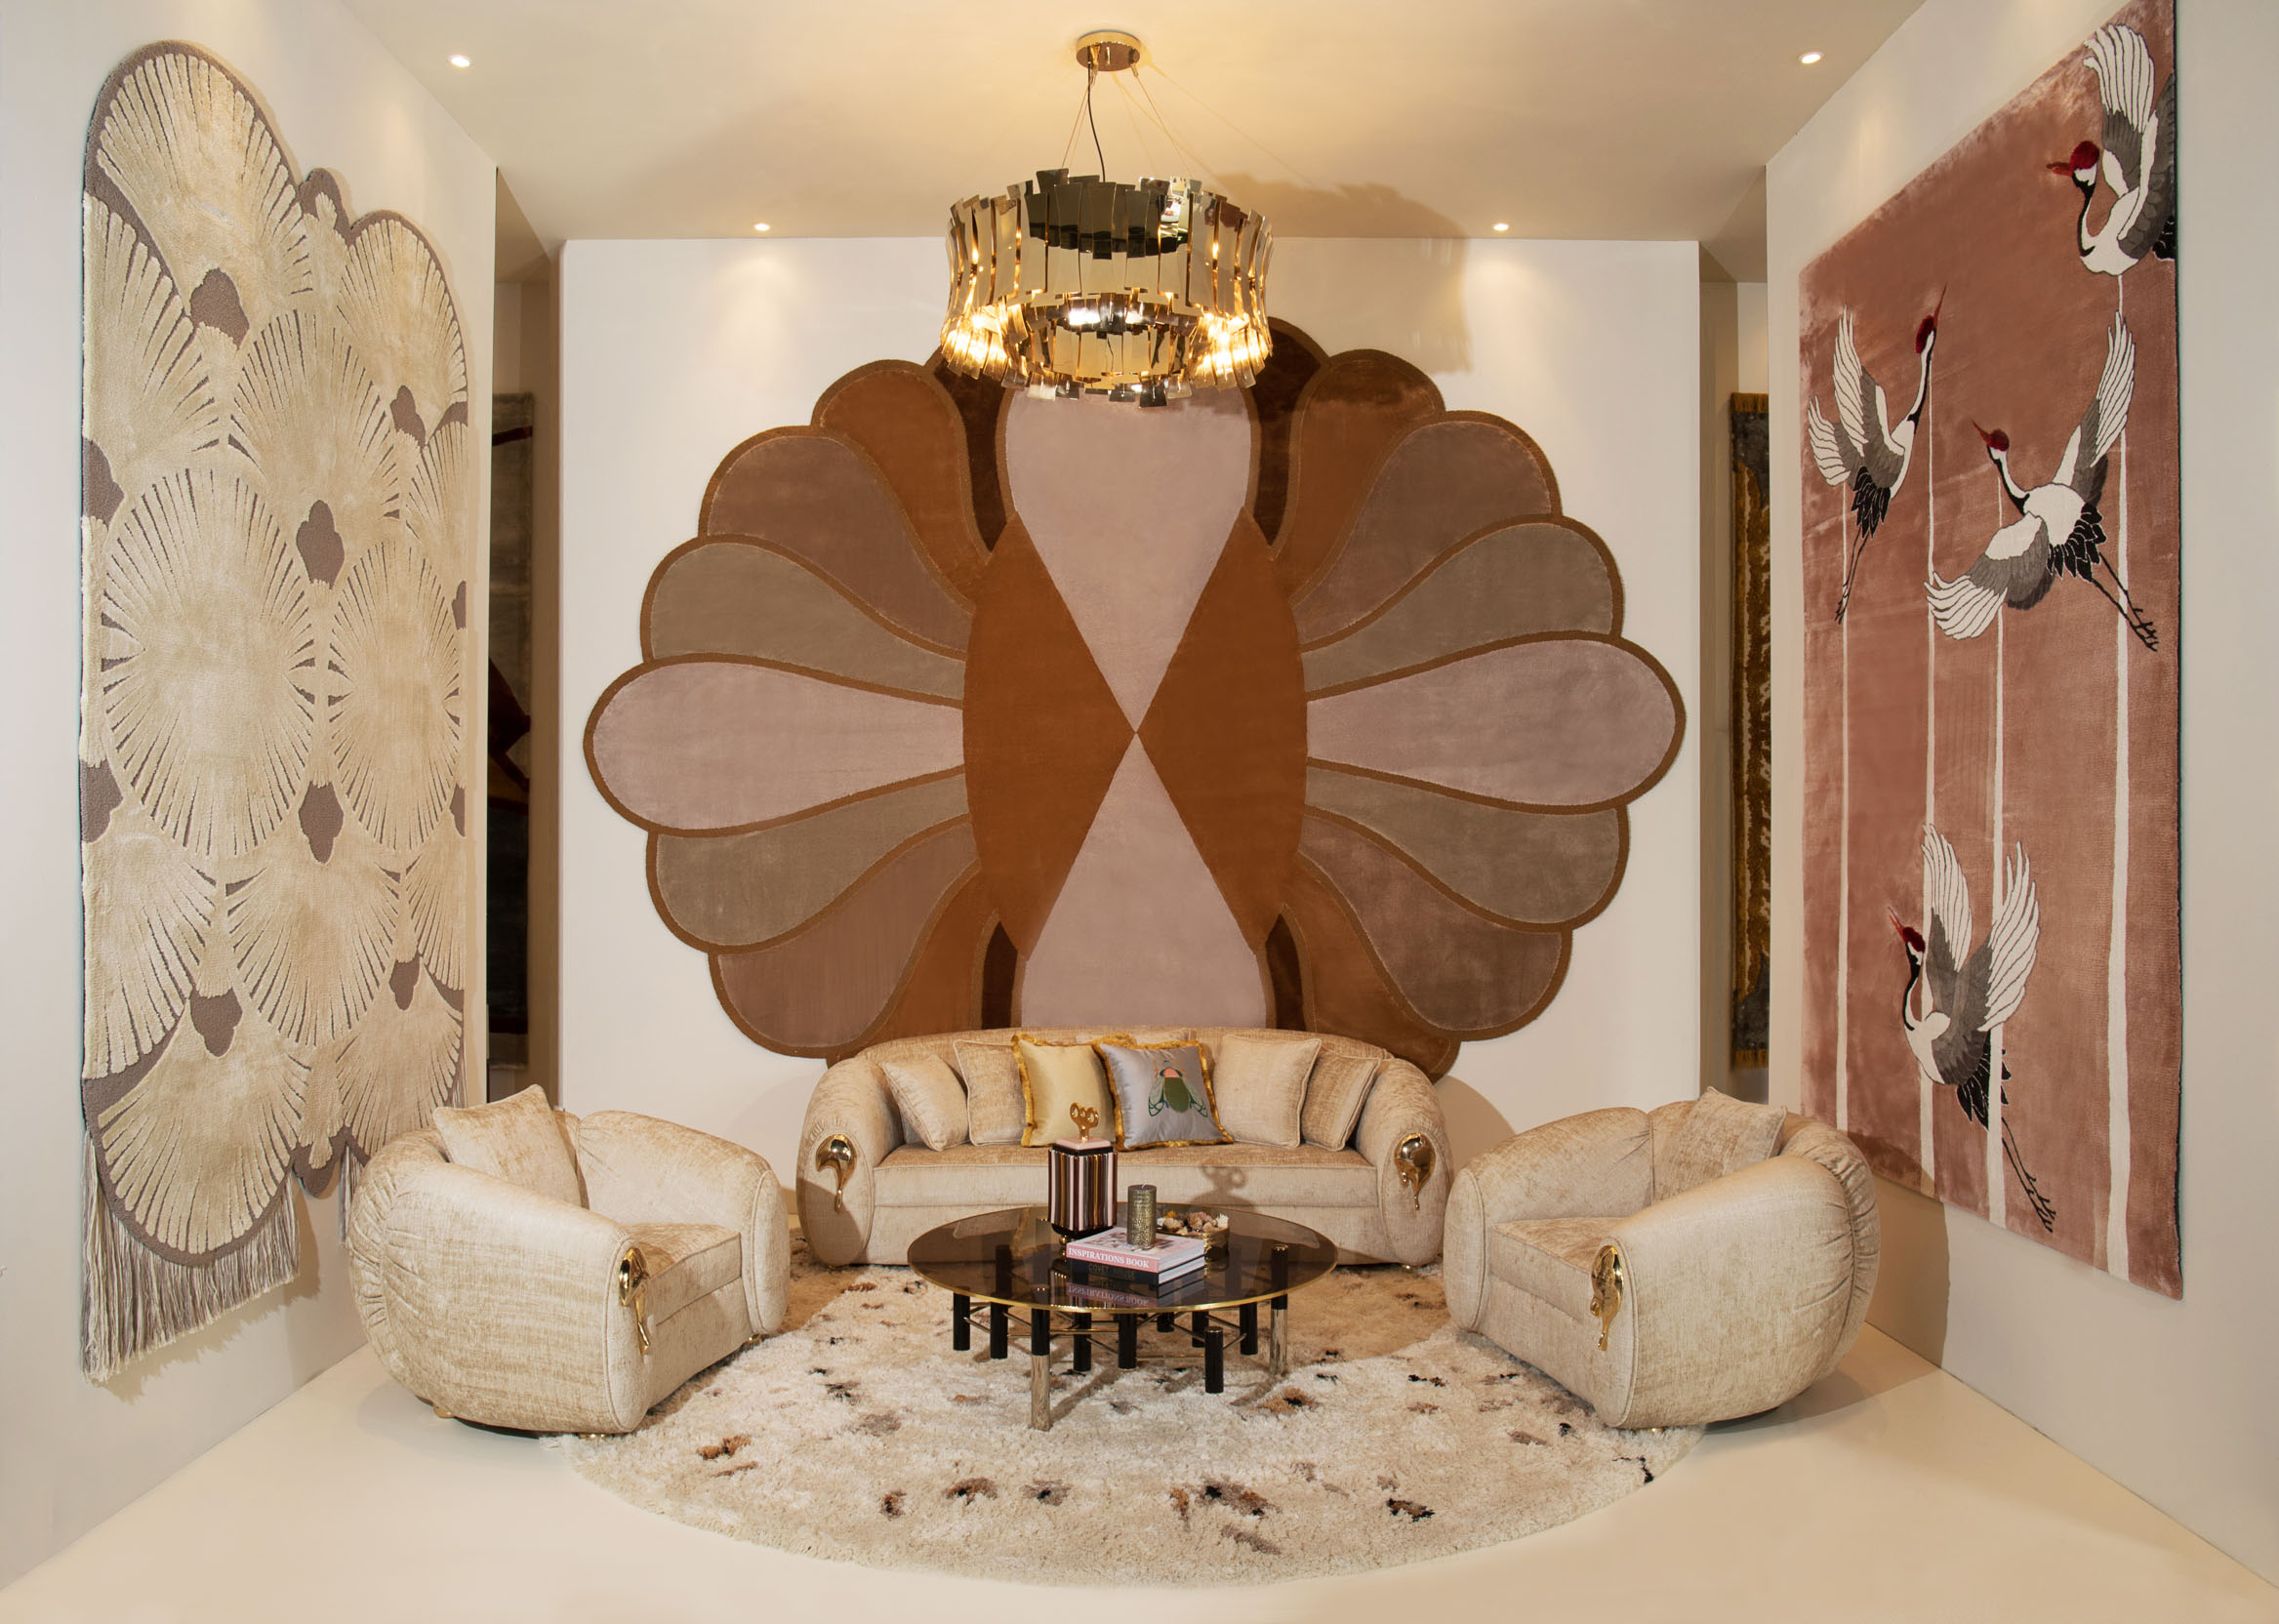 Rug'Society: Handmade Rugs for Luxury Homes